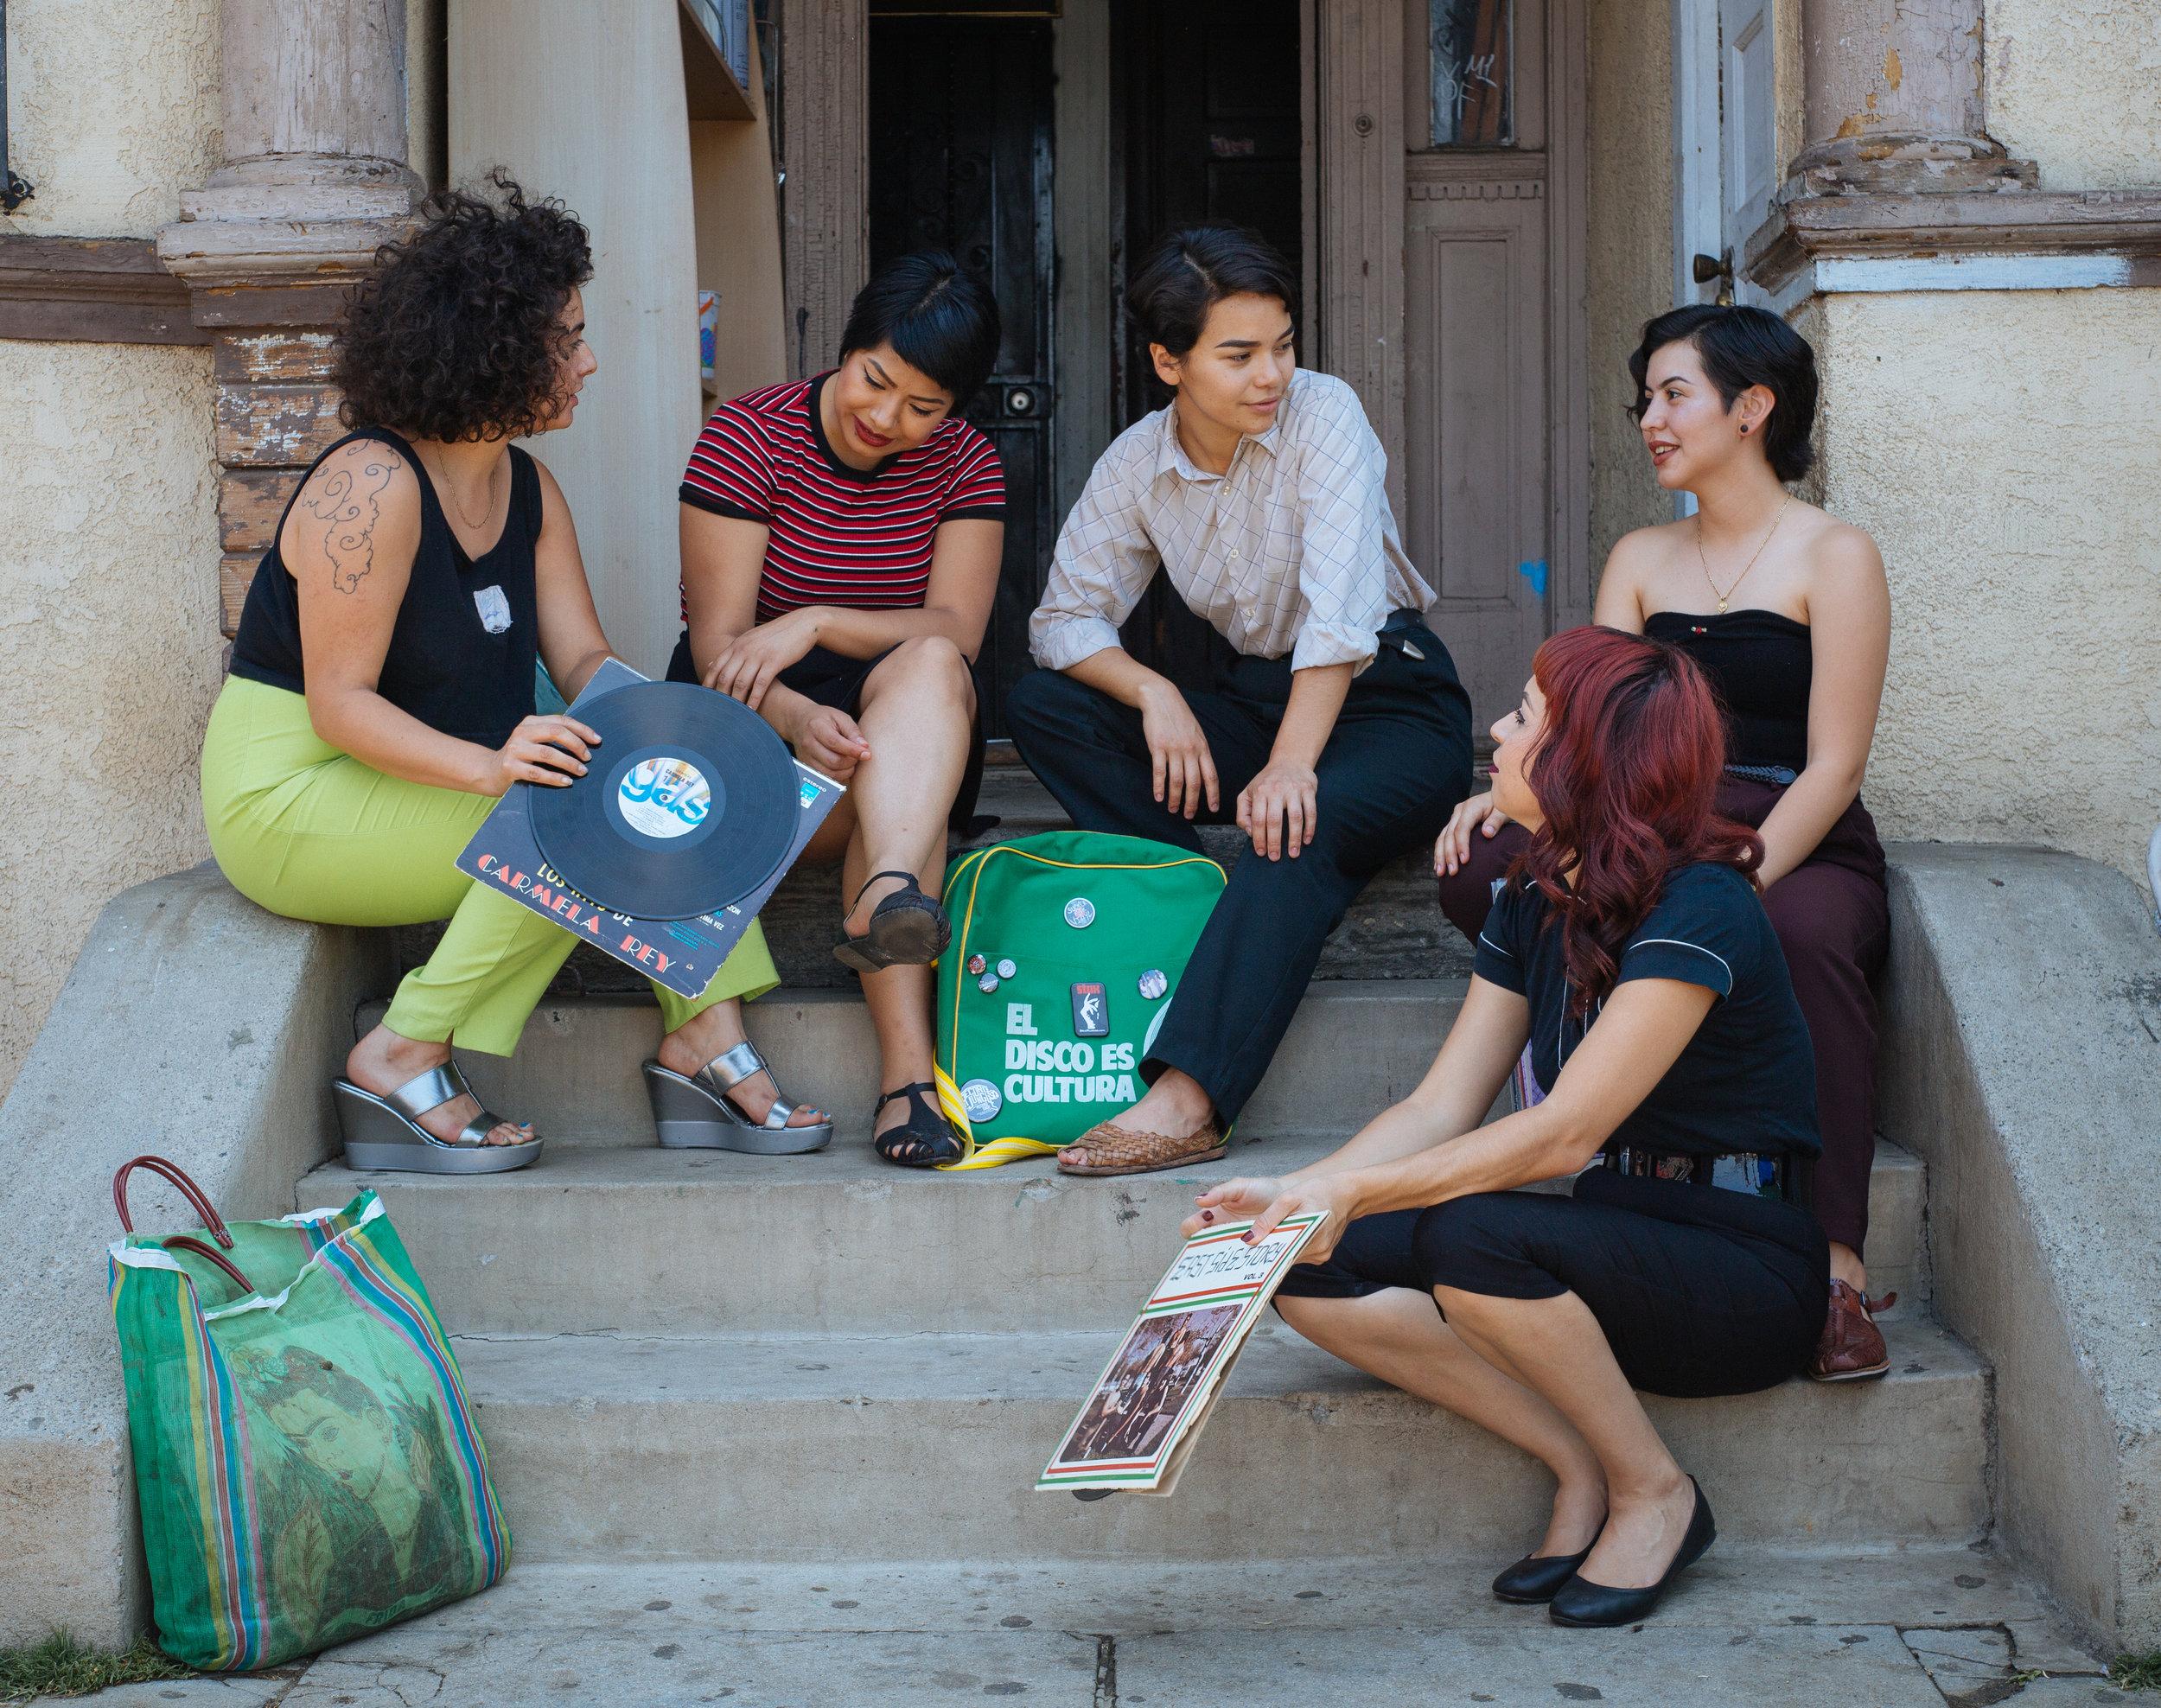 Chulita Vinyl Club, Boyle Heights, California 2016